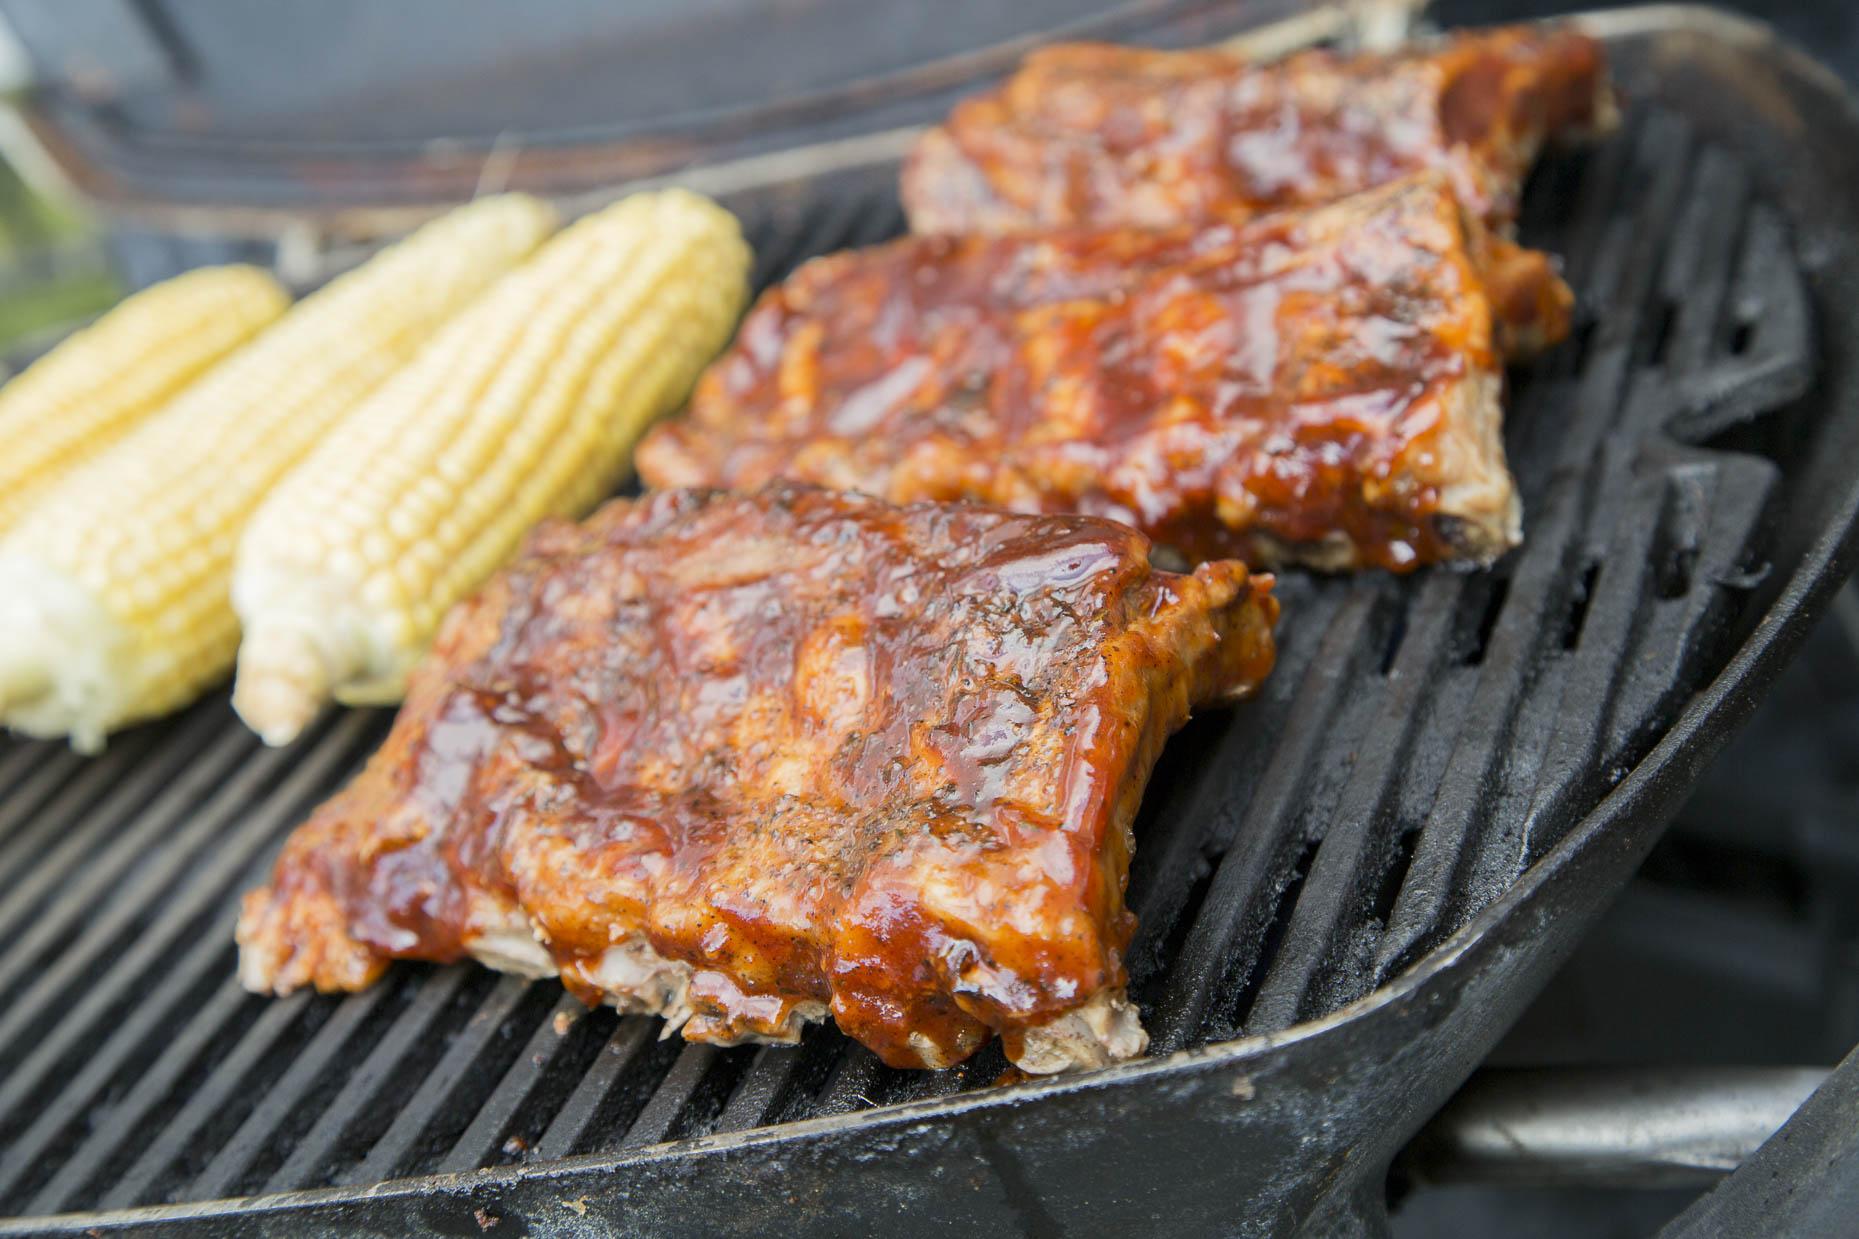 Babyback ribs